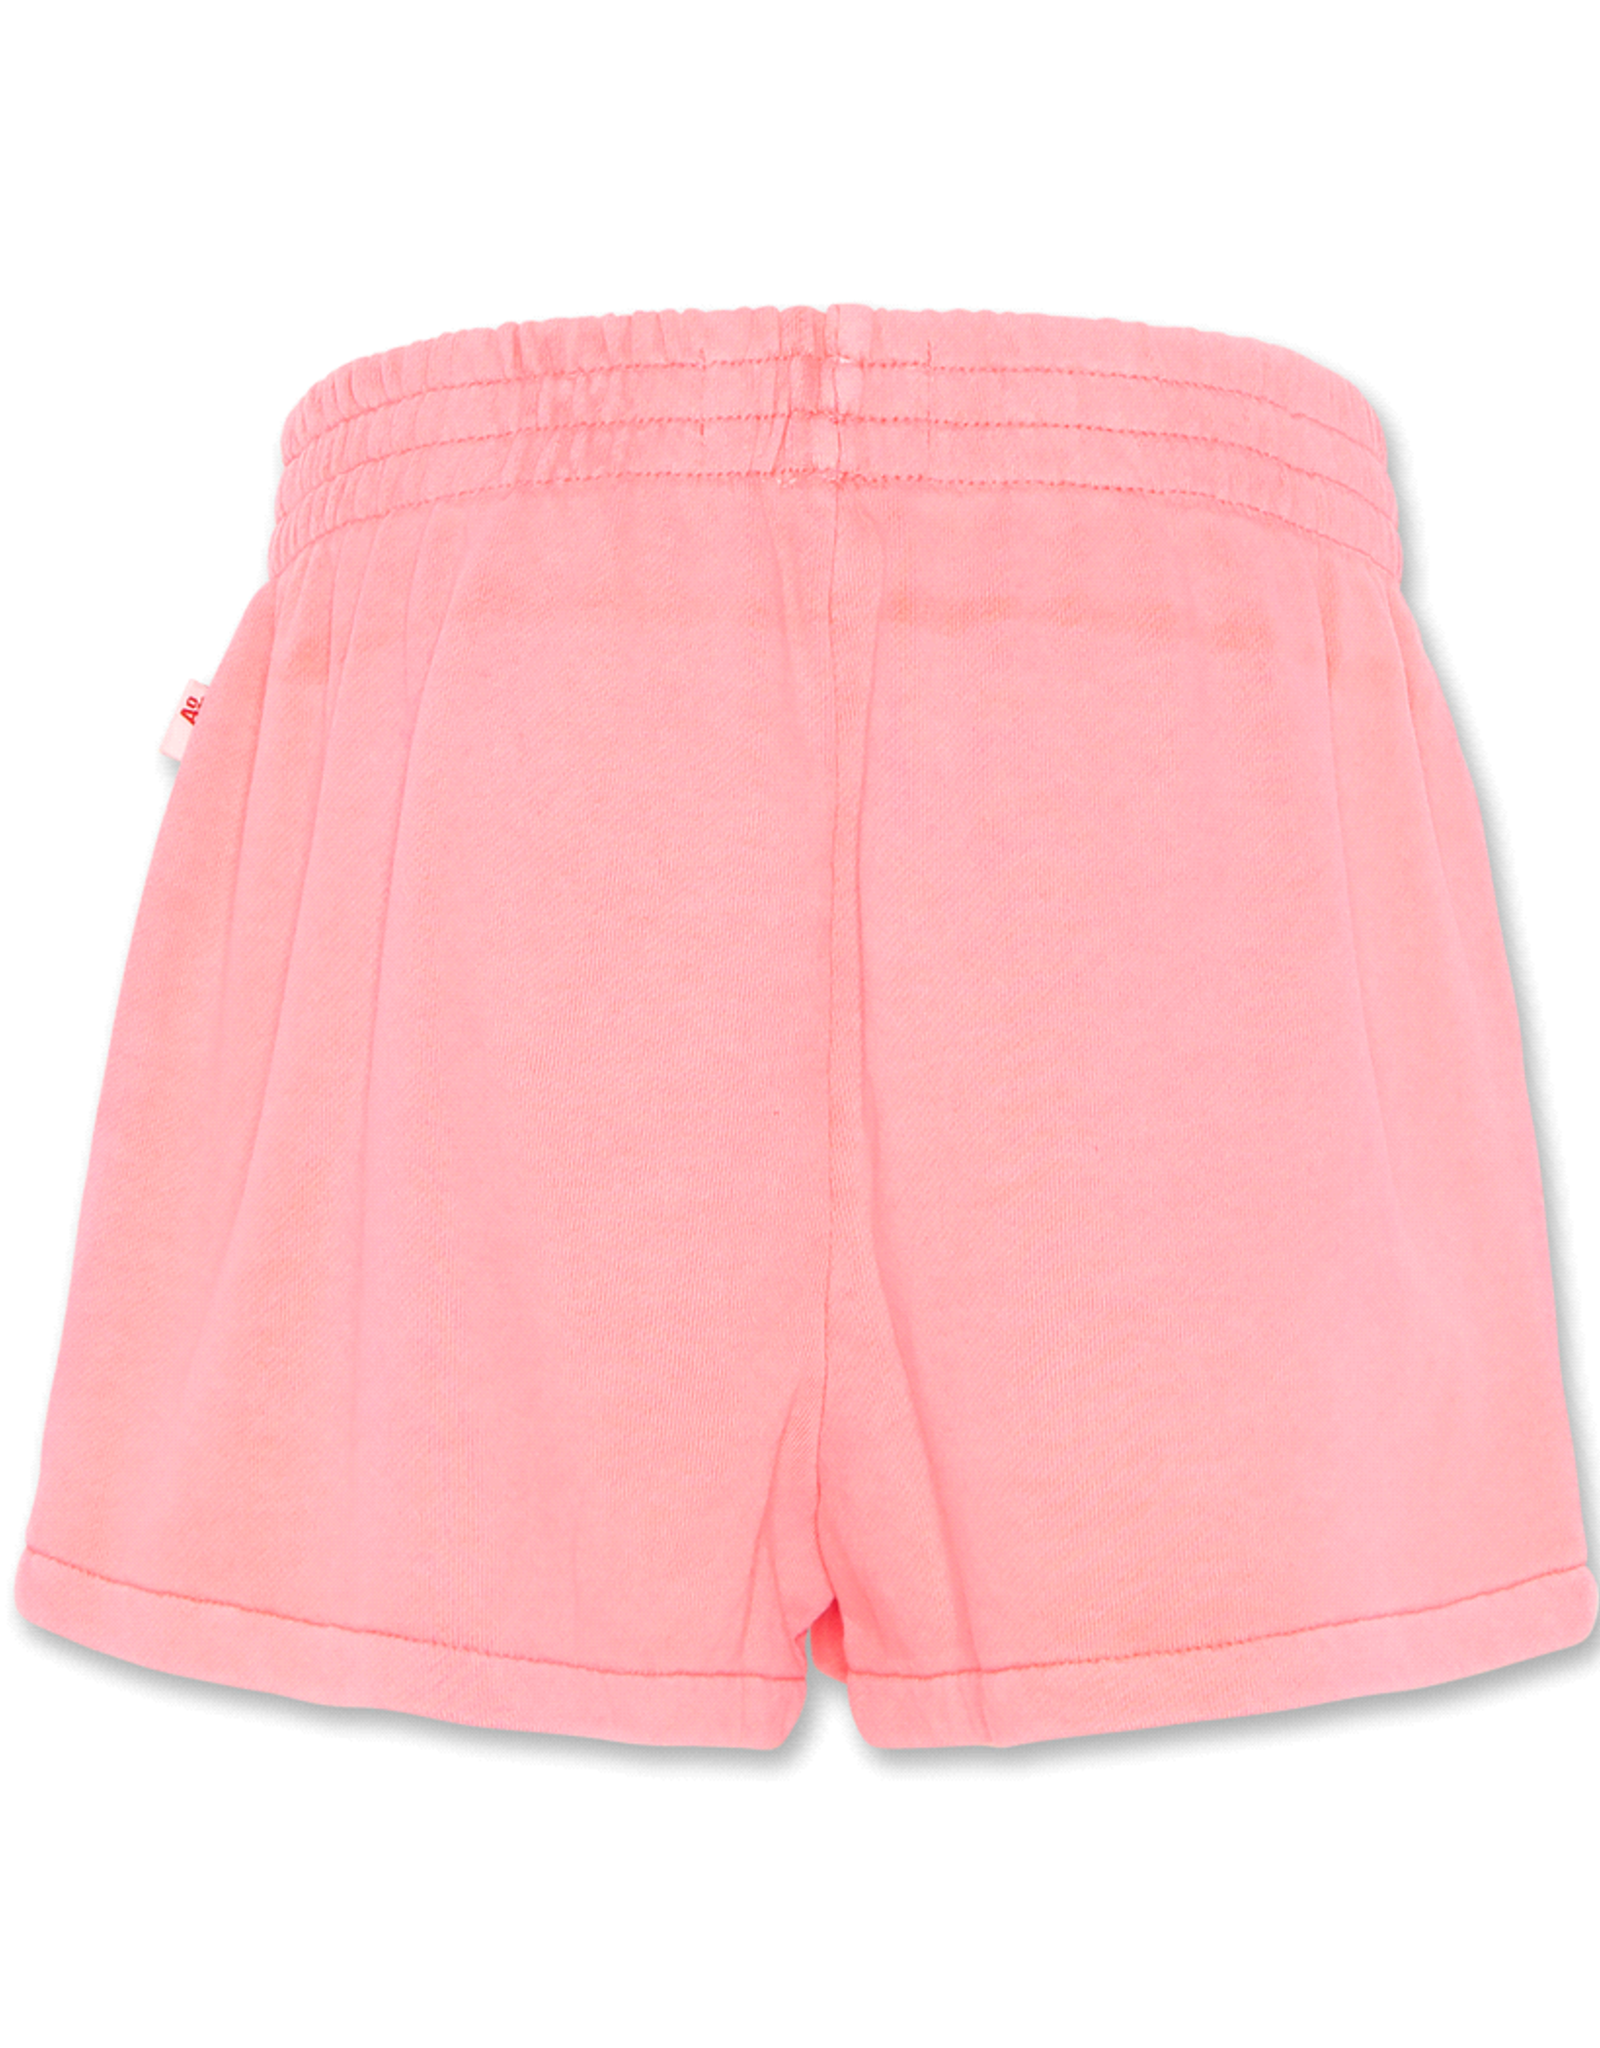 American Outfitters AO sweatshort fluo pink